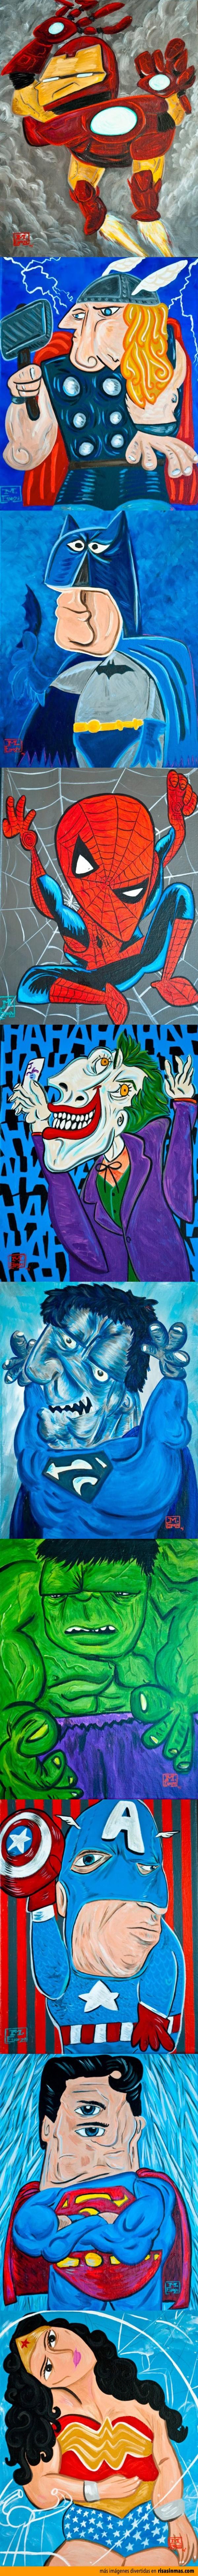 Superhéroes pintados estilo Picasso